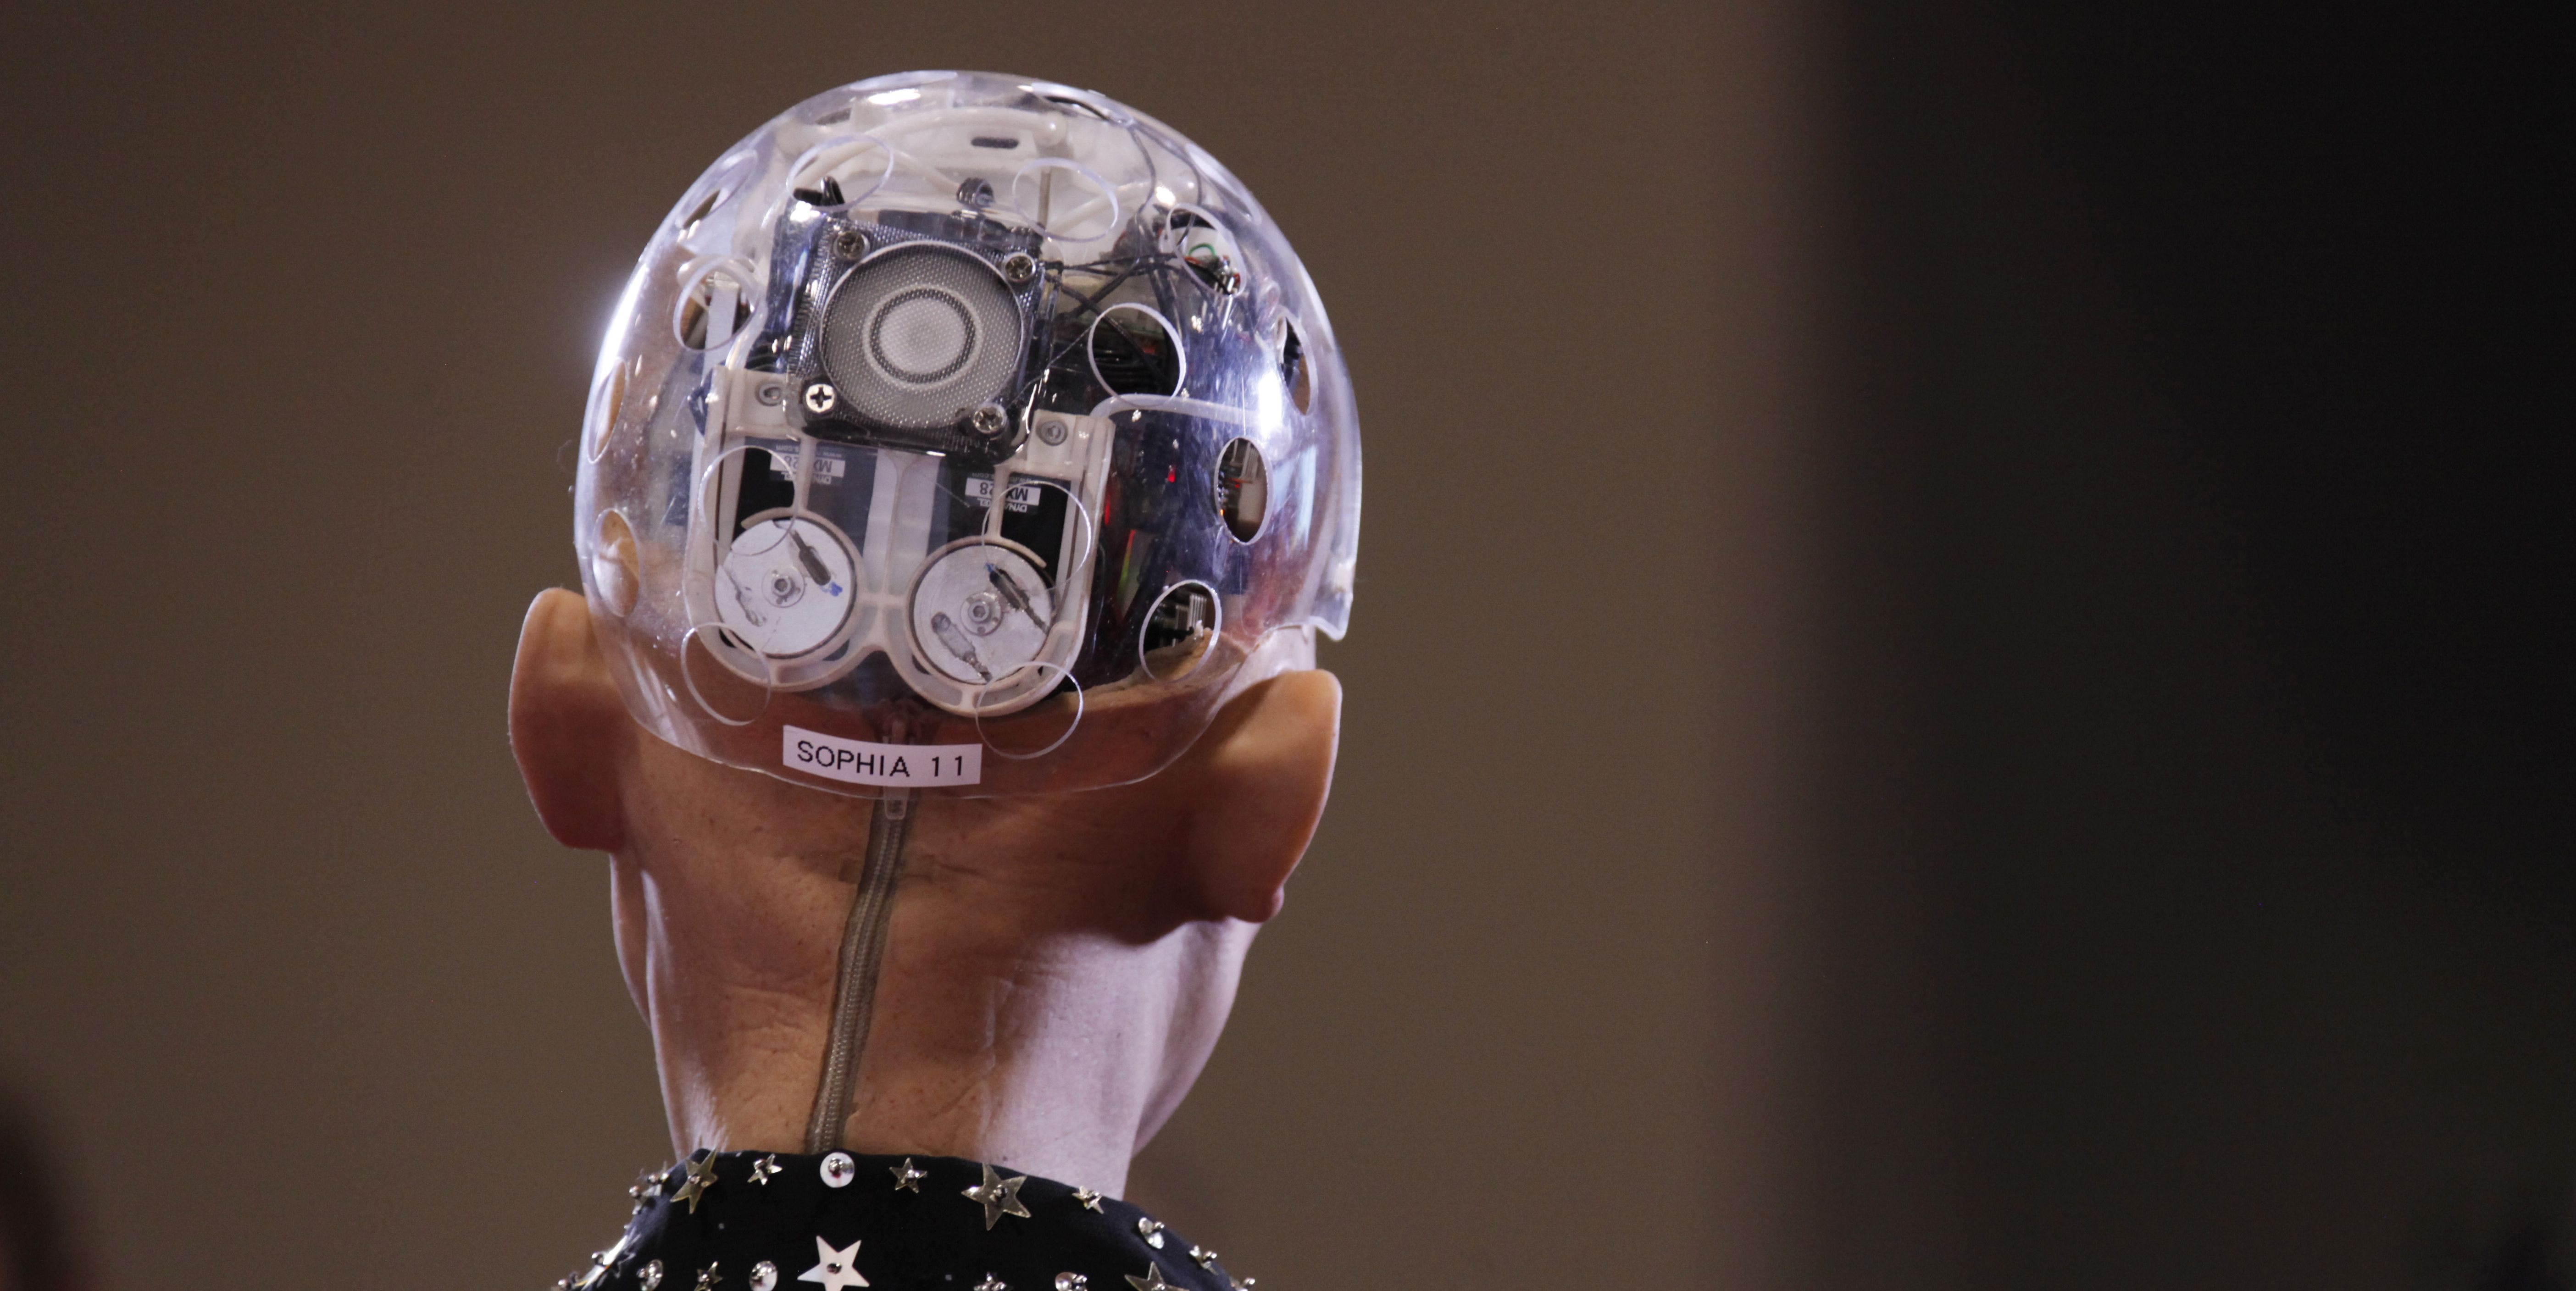 Saudi-arabian-citizen-humanoid-robot-sophia-is-seen-during-news-photo-954231504-1537273815.jpg?crop=1.00xw:0.752xh;0,0